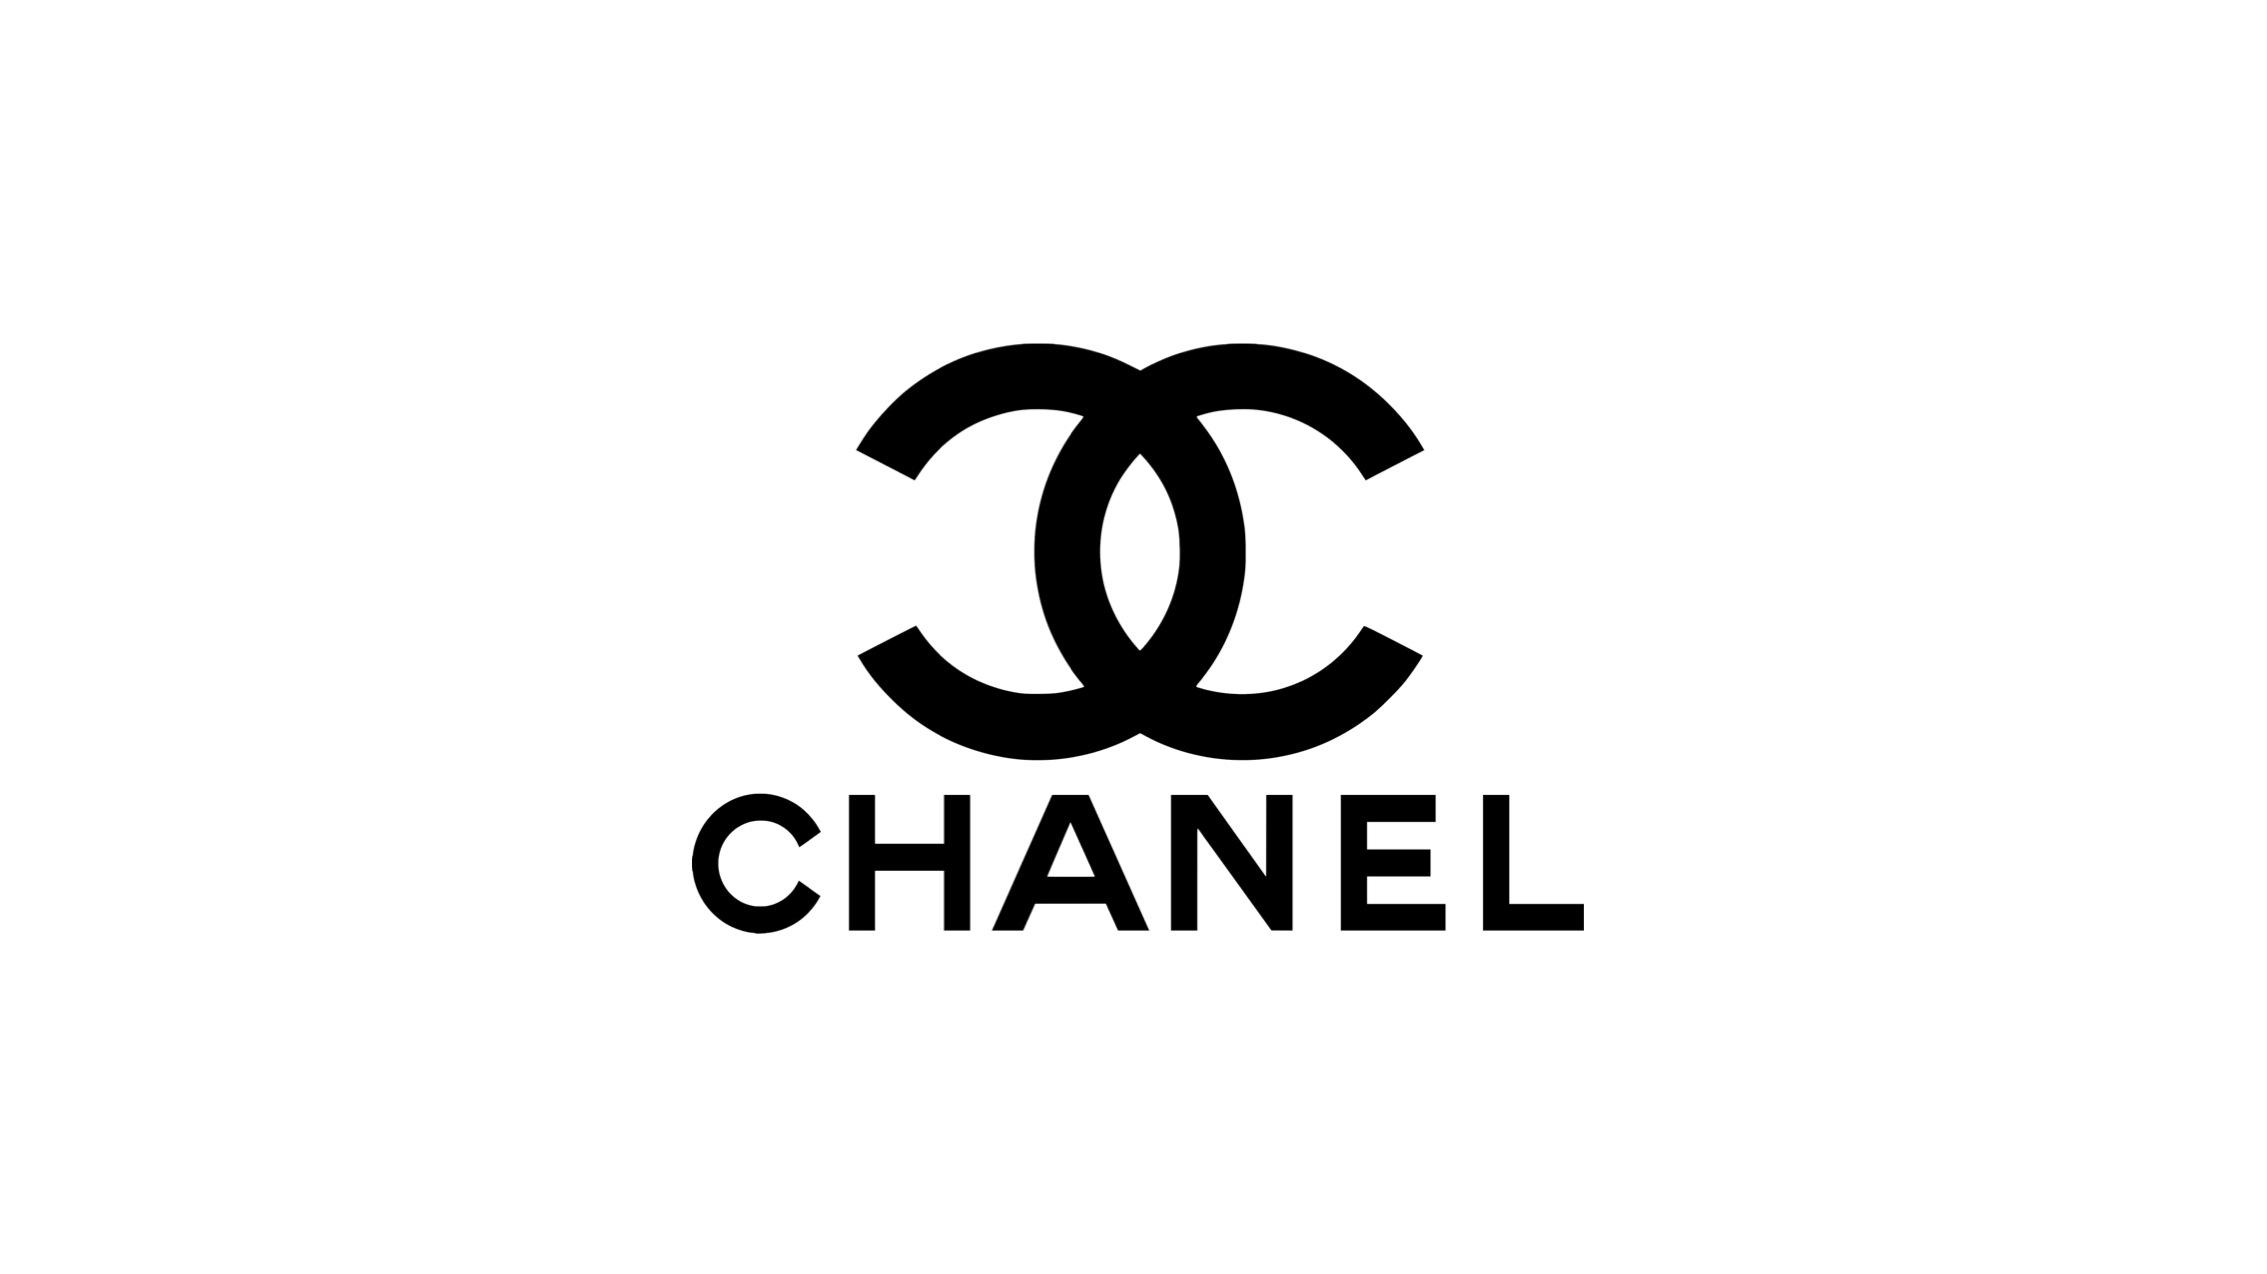 CHANEL Logo Wallpaper